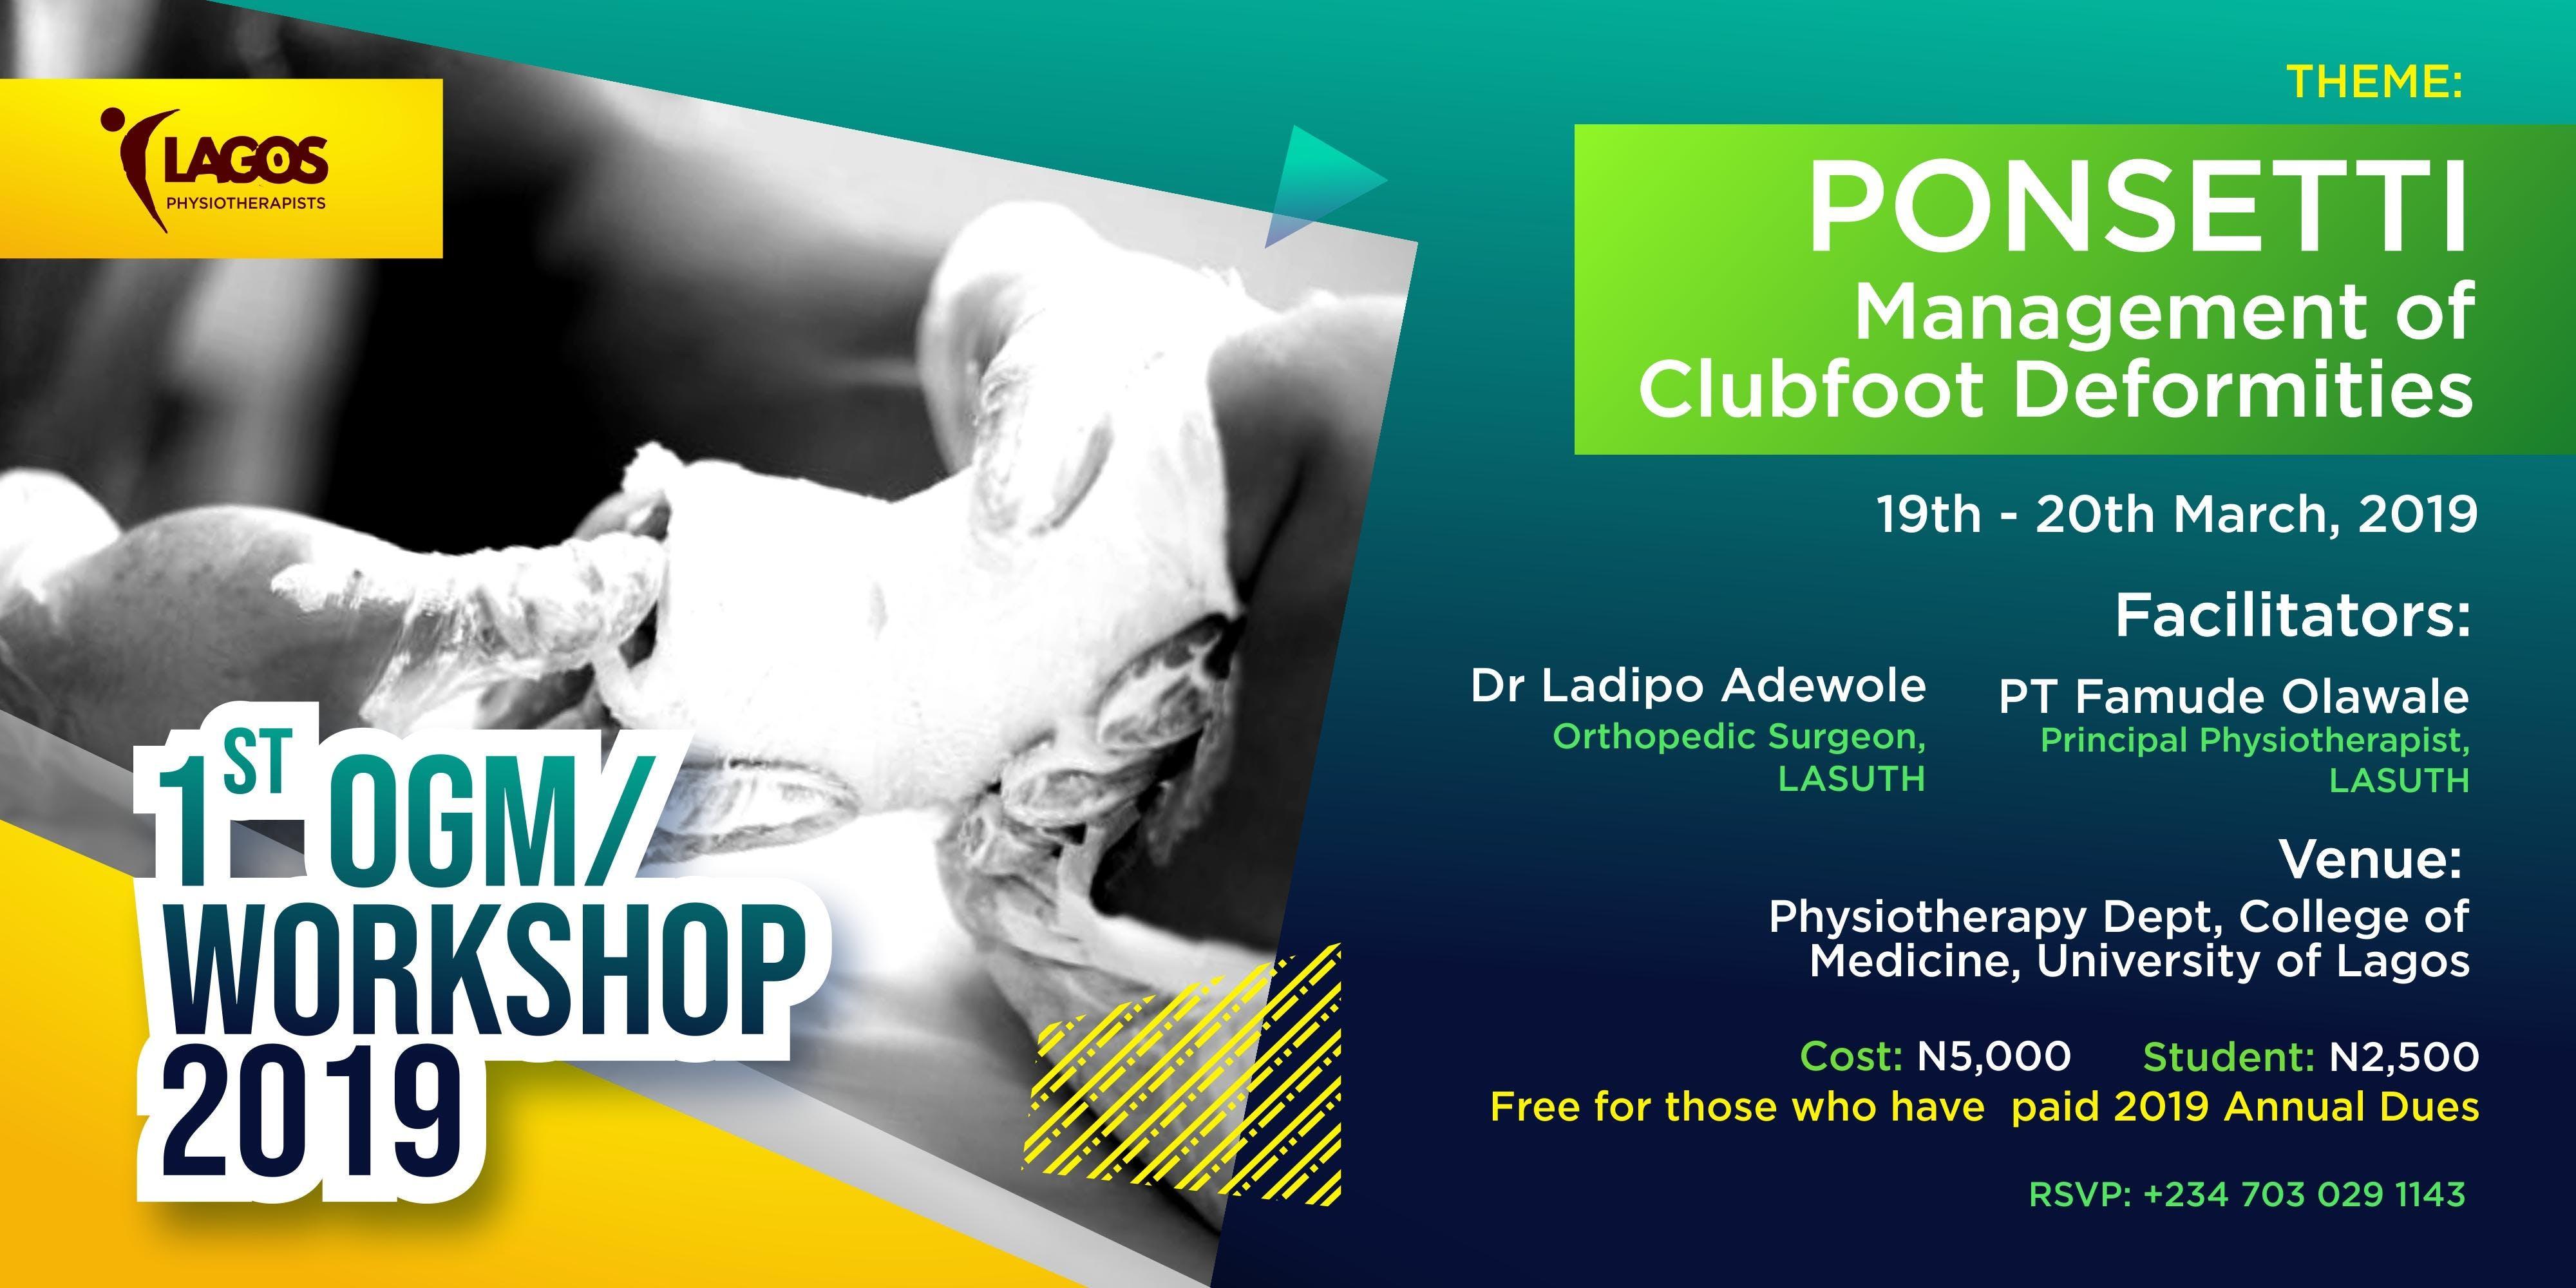 Lagos Physiotherapists' 1st OGM / Ponsetti Wo